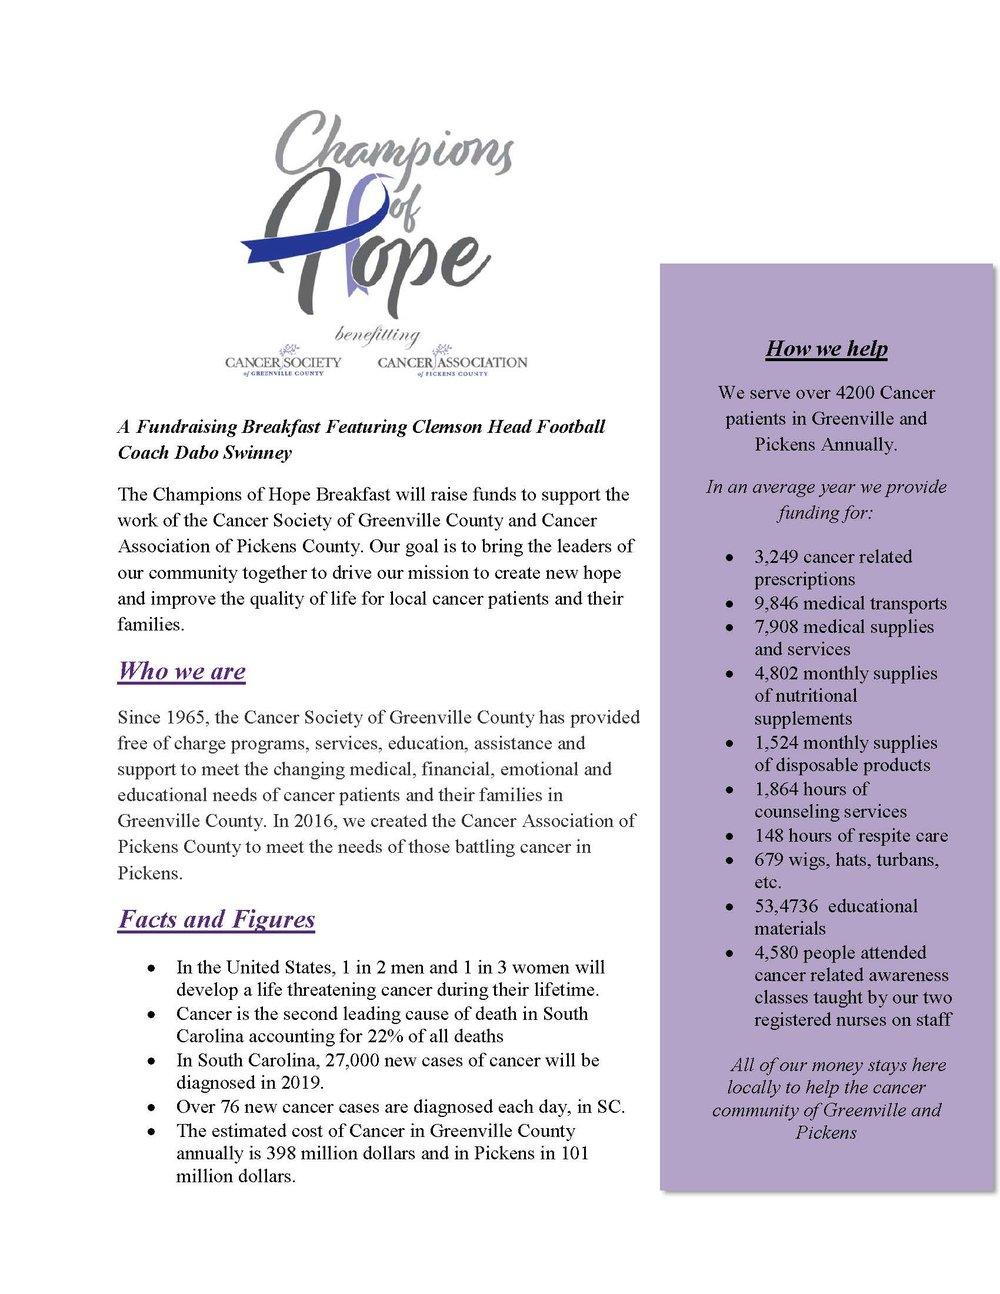 Champions of Hope Breakfast Sponsorships-final8_Page_1.jpg